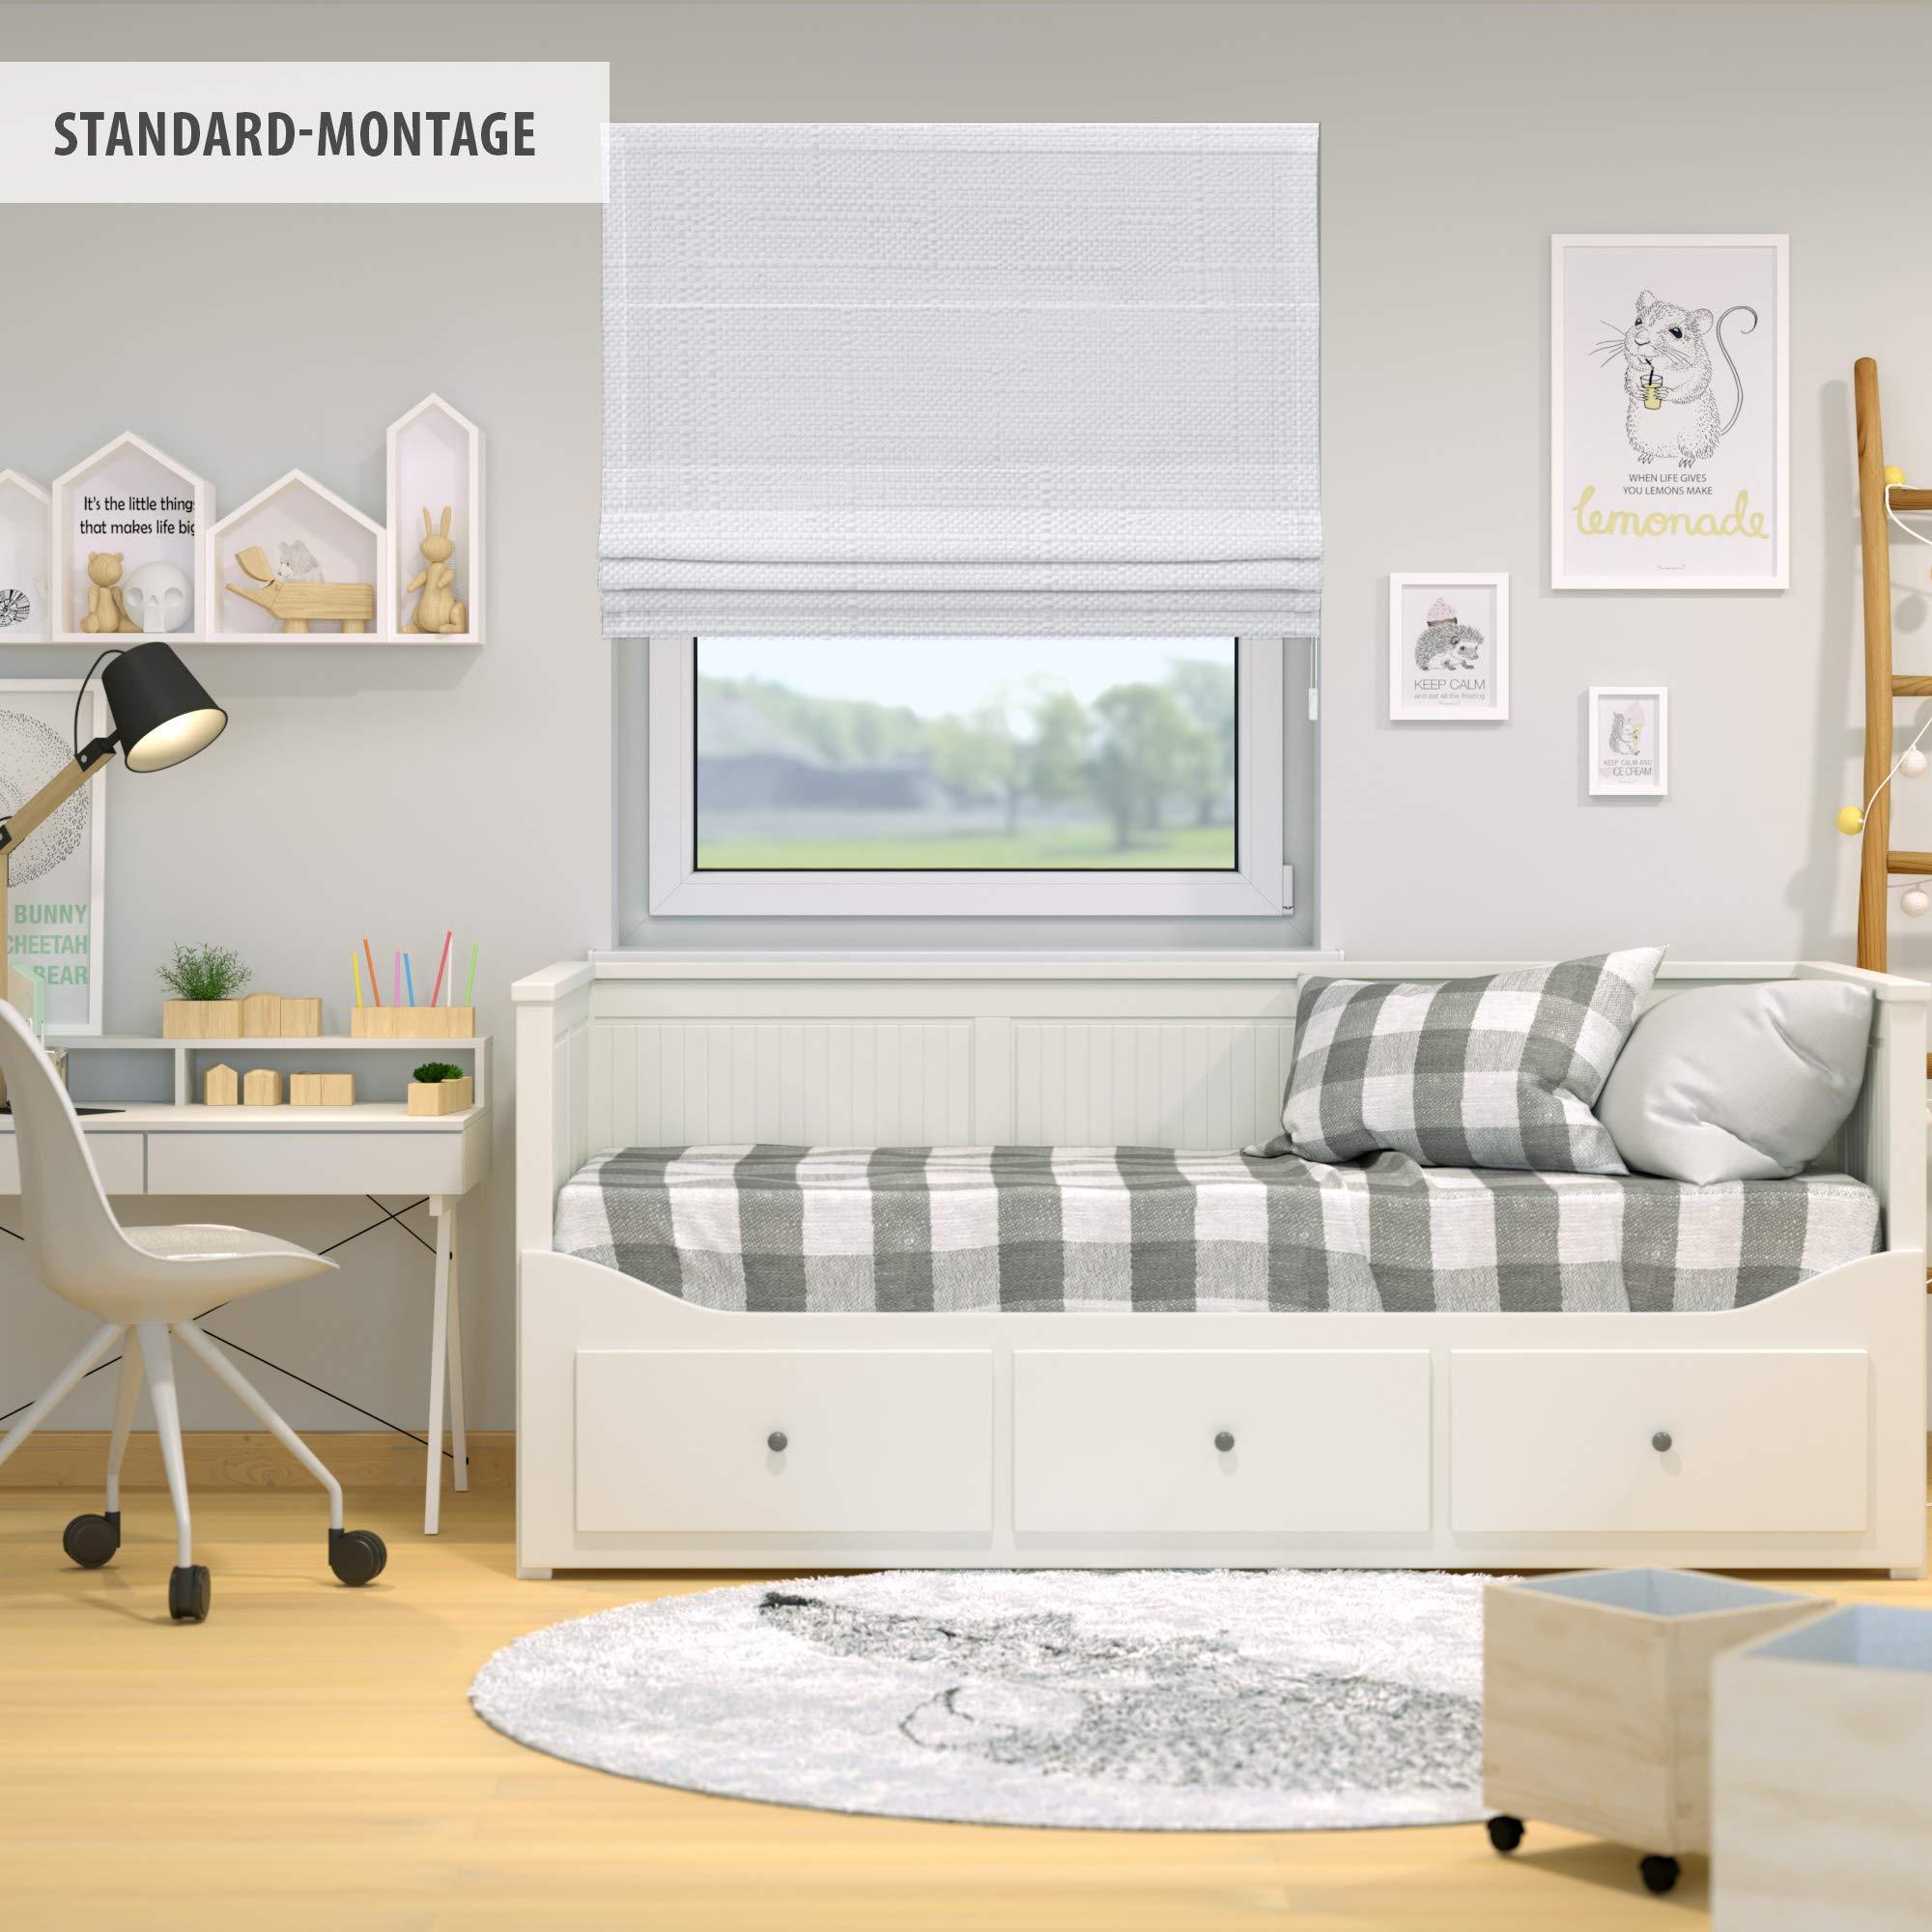 Victoria M. Ivora Estor Plegable, Cortina Plegable paqueto, 17 x 17 cm,  Blanco Estructurado